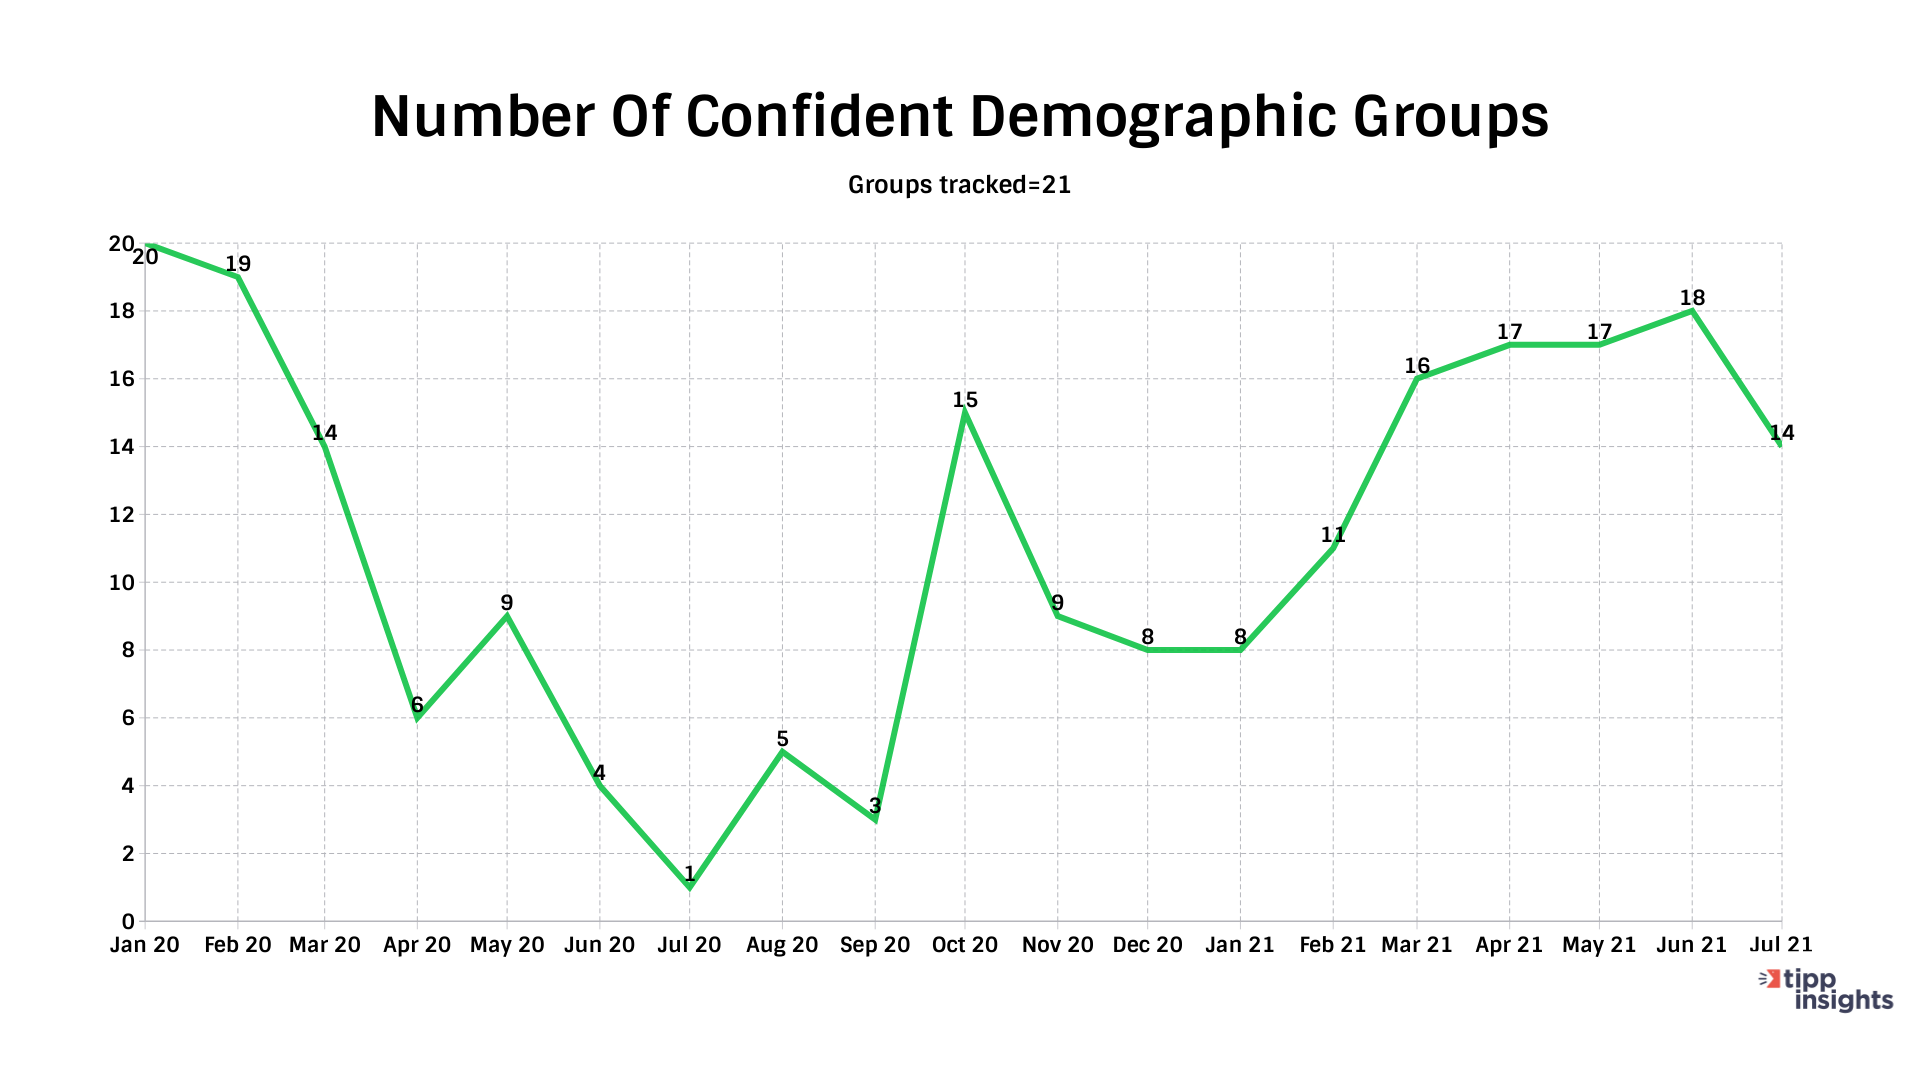 IBD/TIPP Economic Optimism Index Number Of Confident Demographic Groups